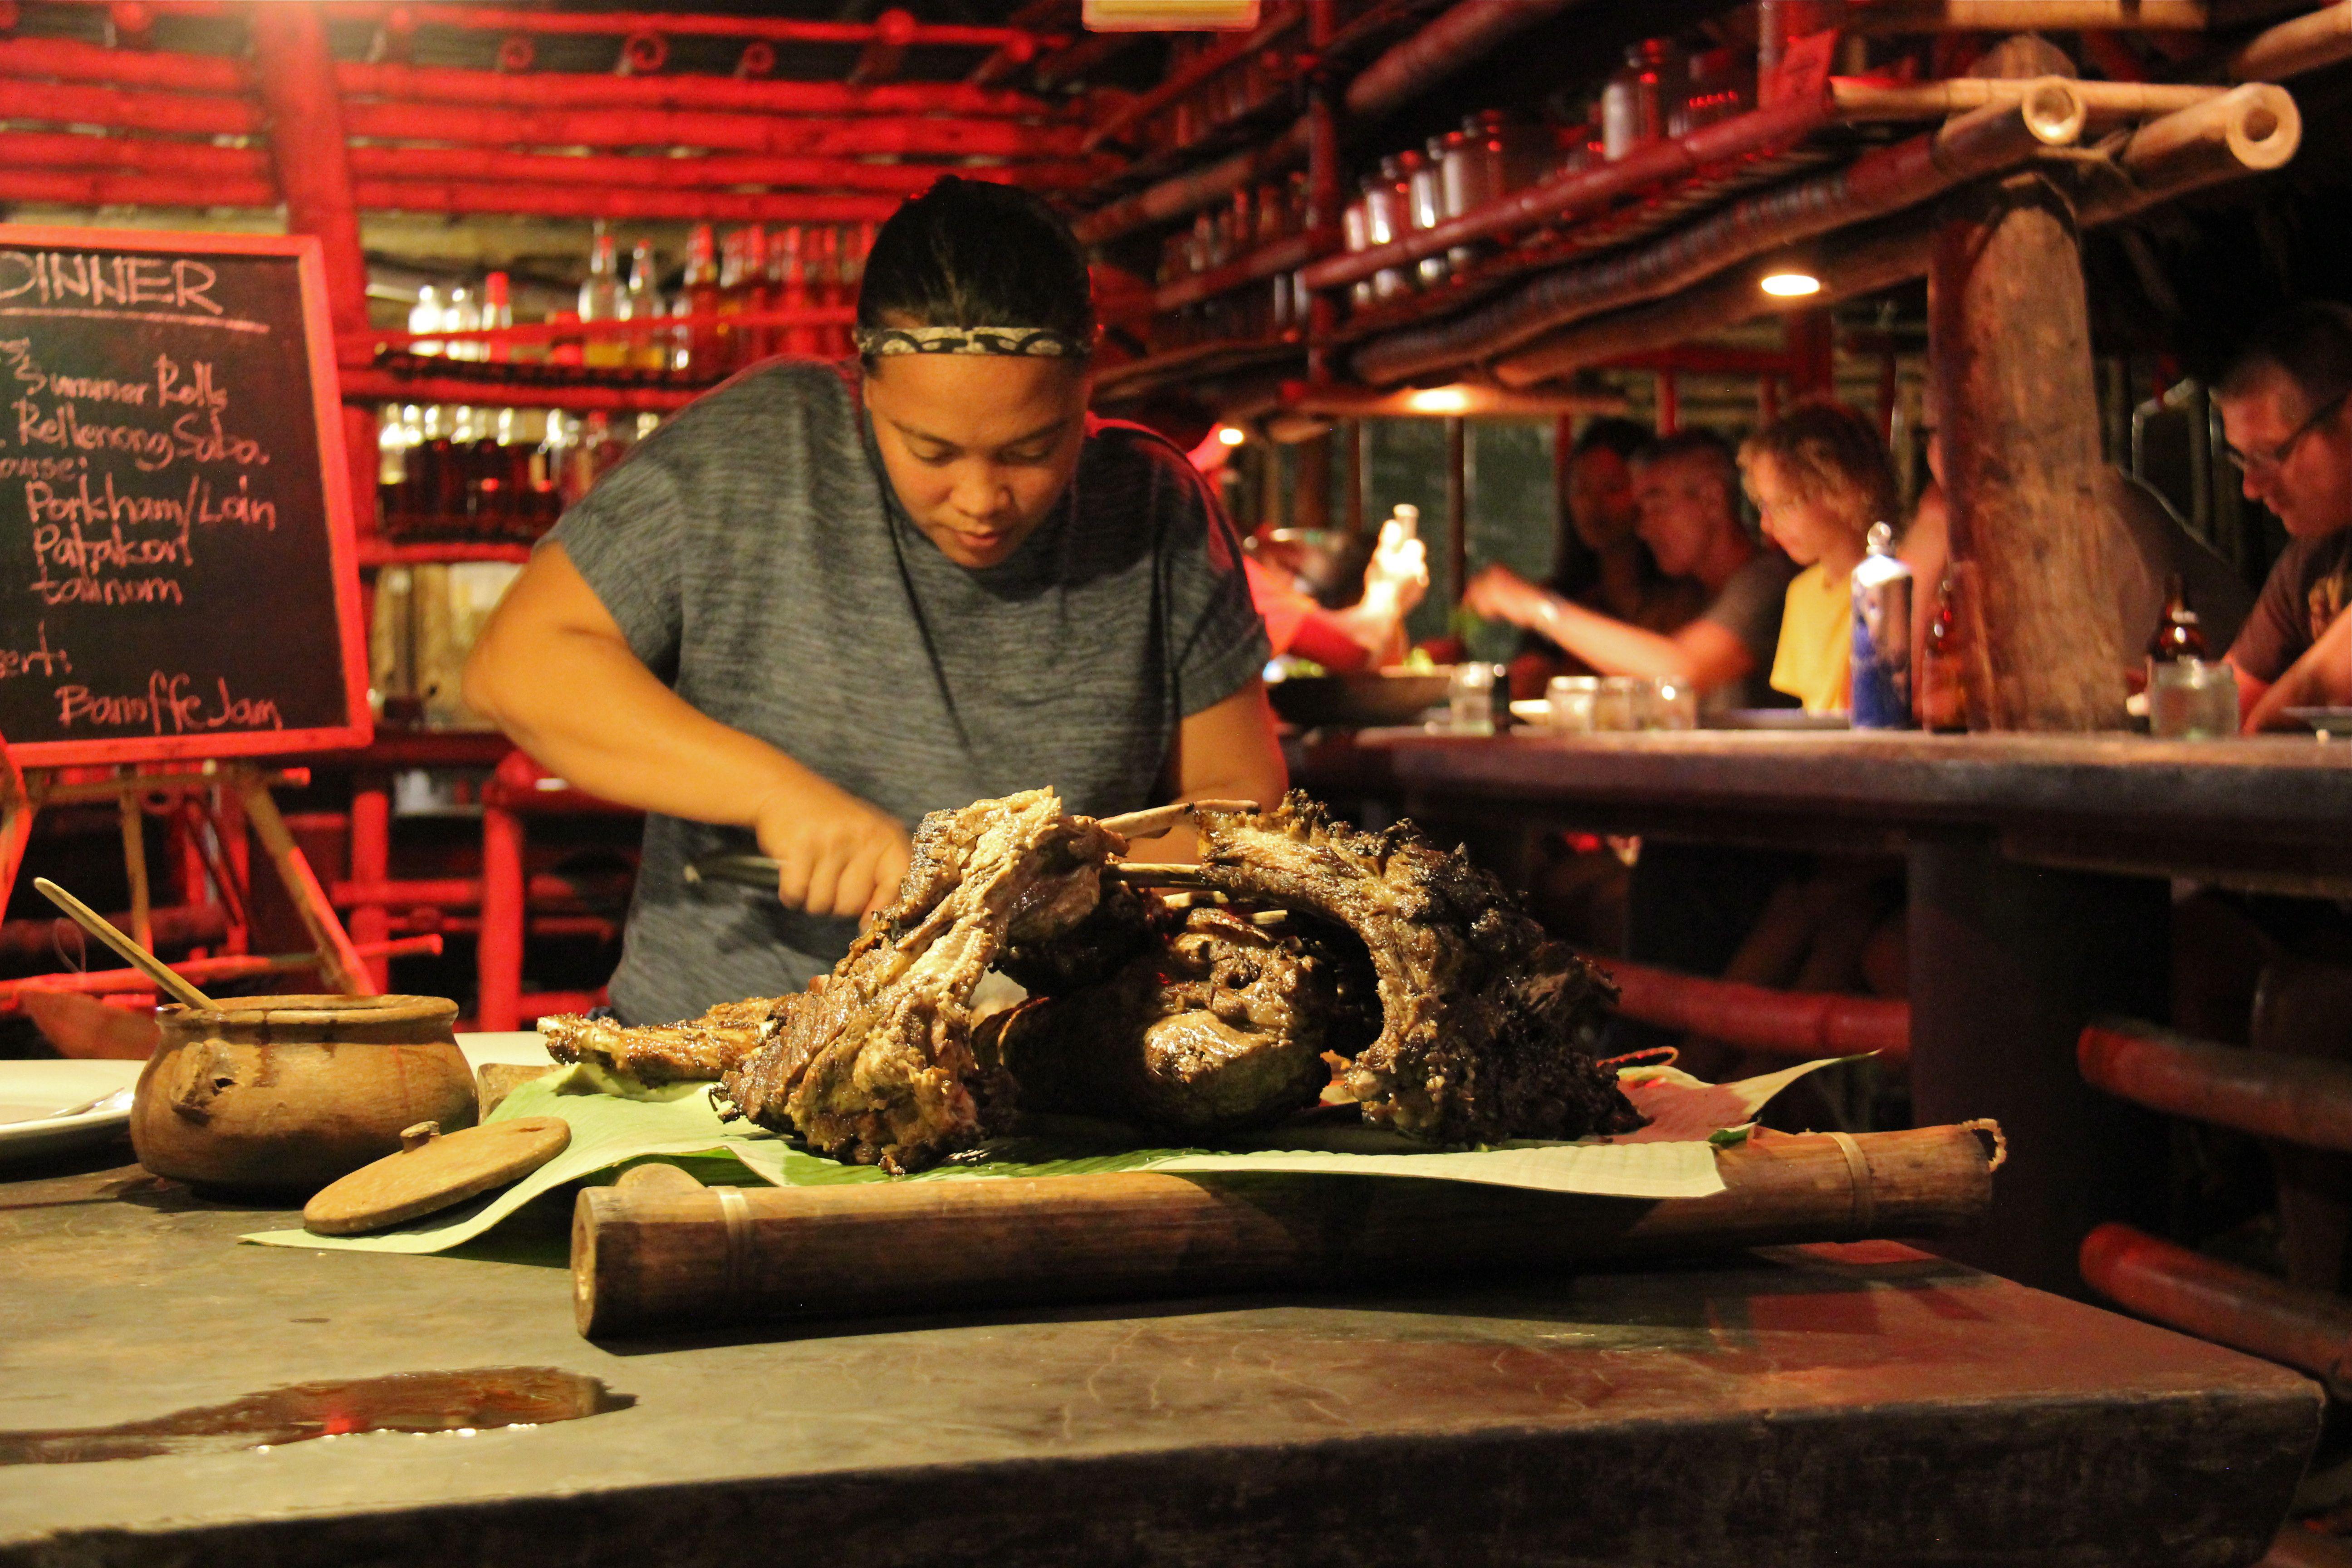 Poitrine de porc fondante et marinée façon adobo philippin, grillée au barbecue